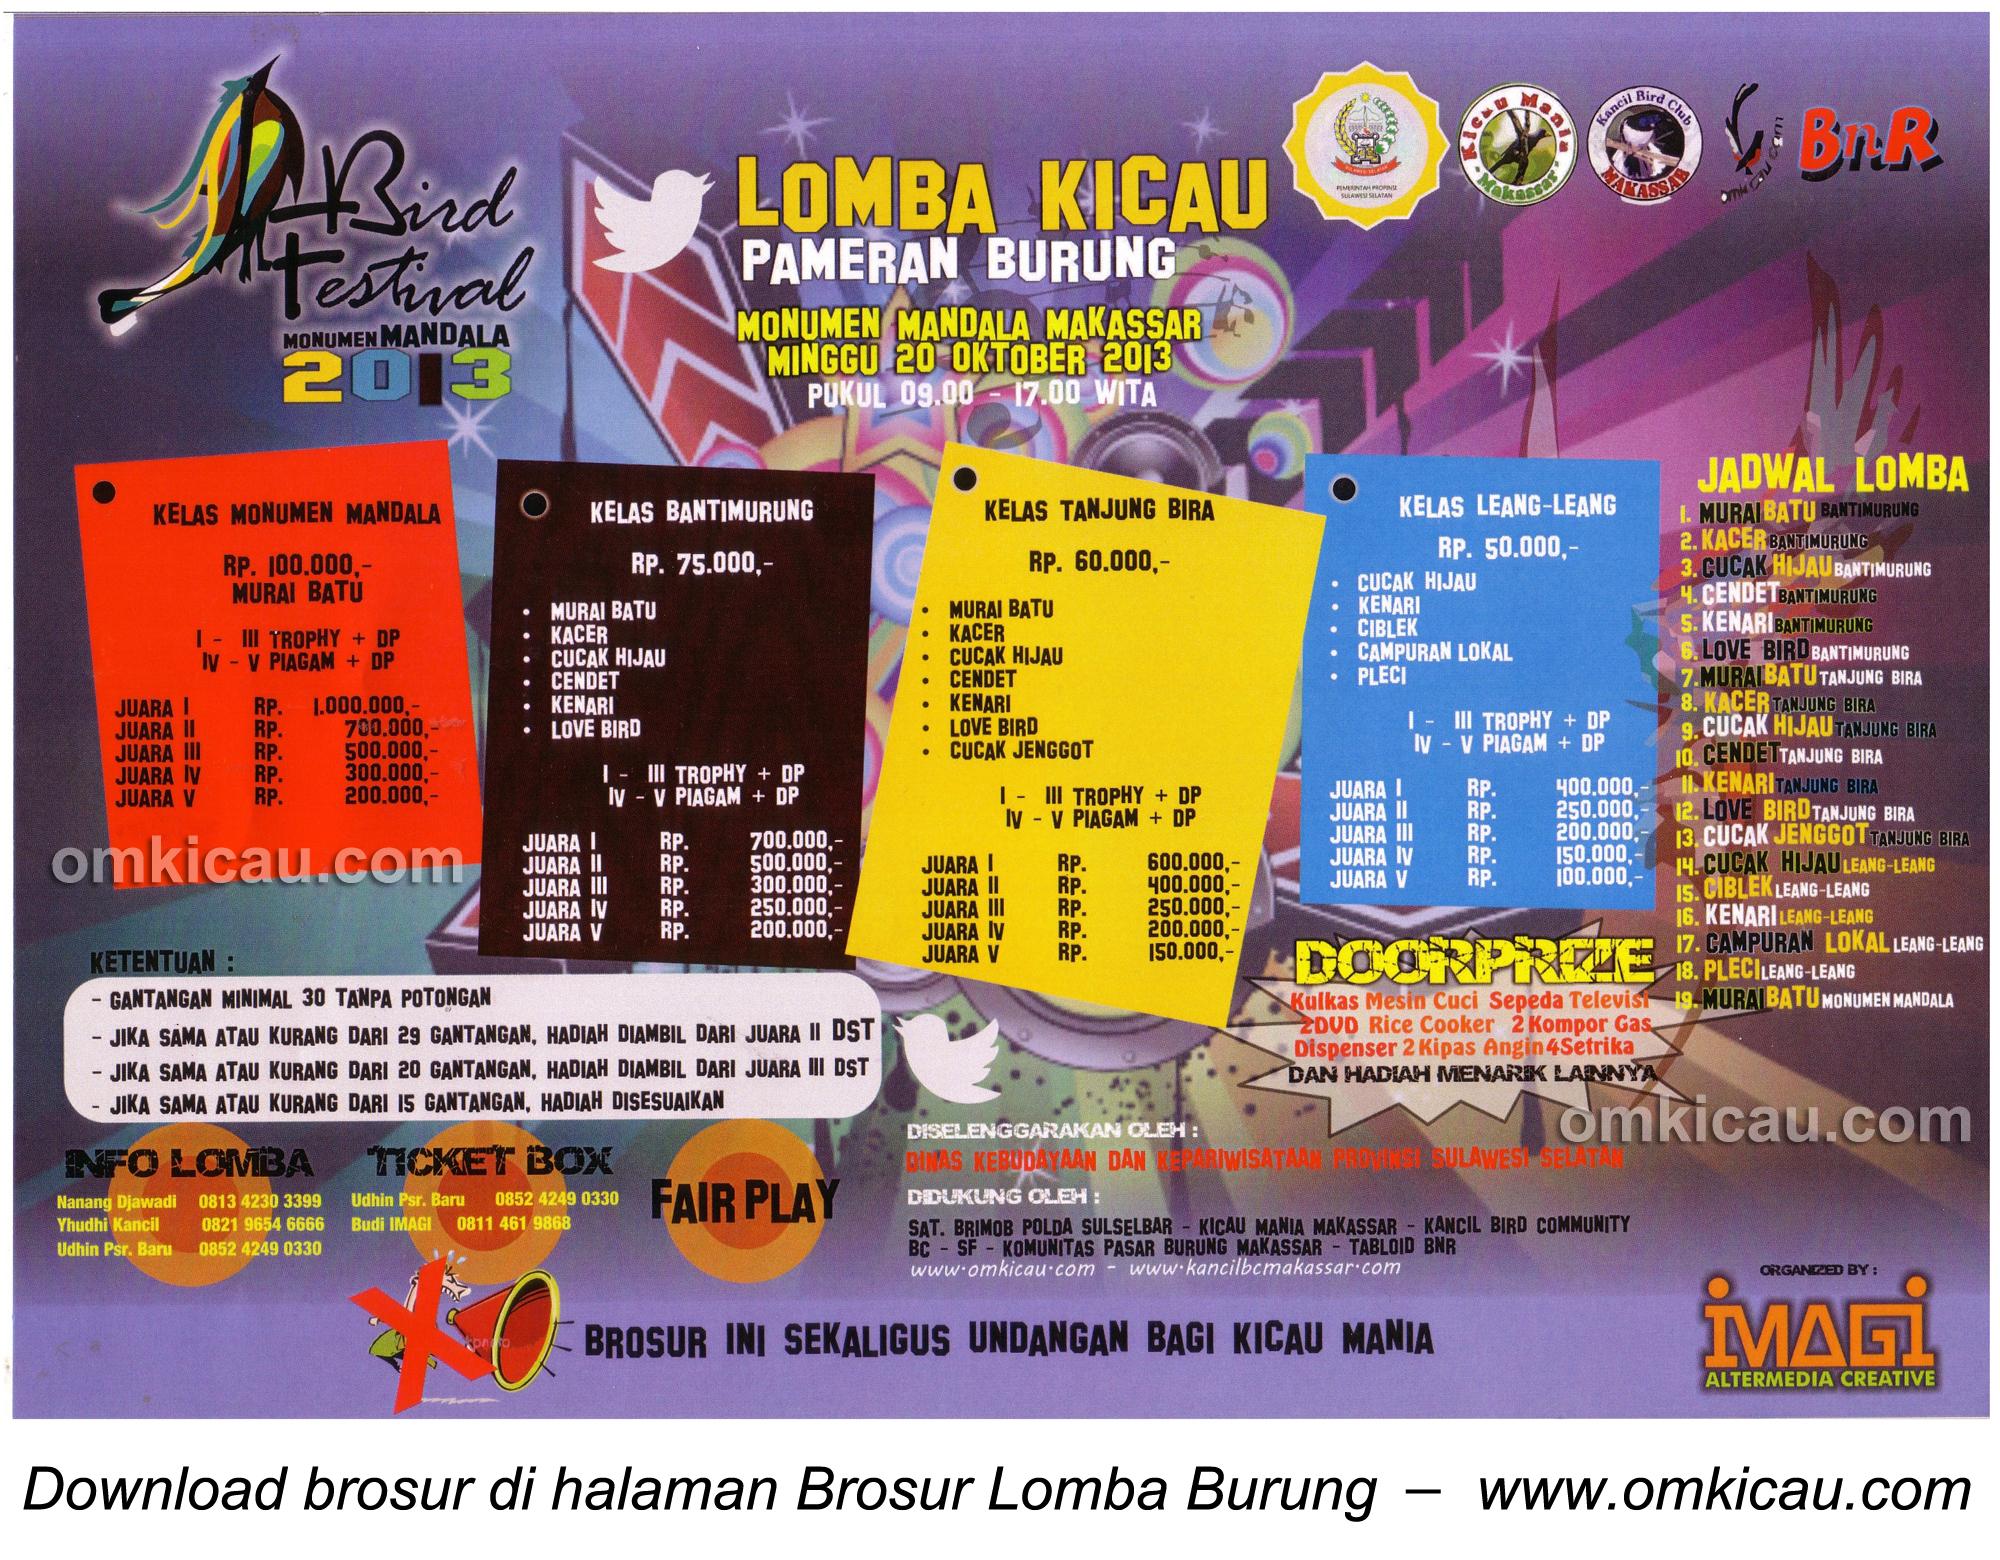 Brosur Lomba Burung Berkicau Bird Festival, Makassar, 20 Oktober 2013